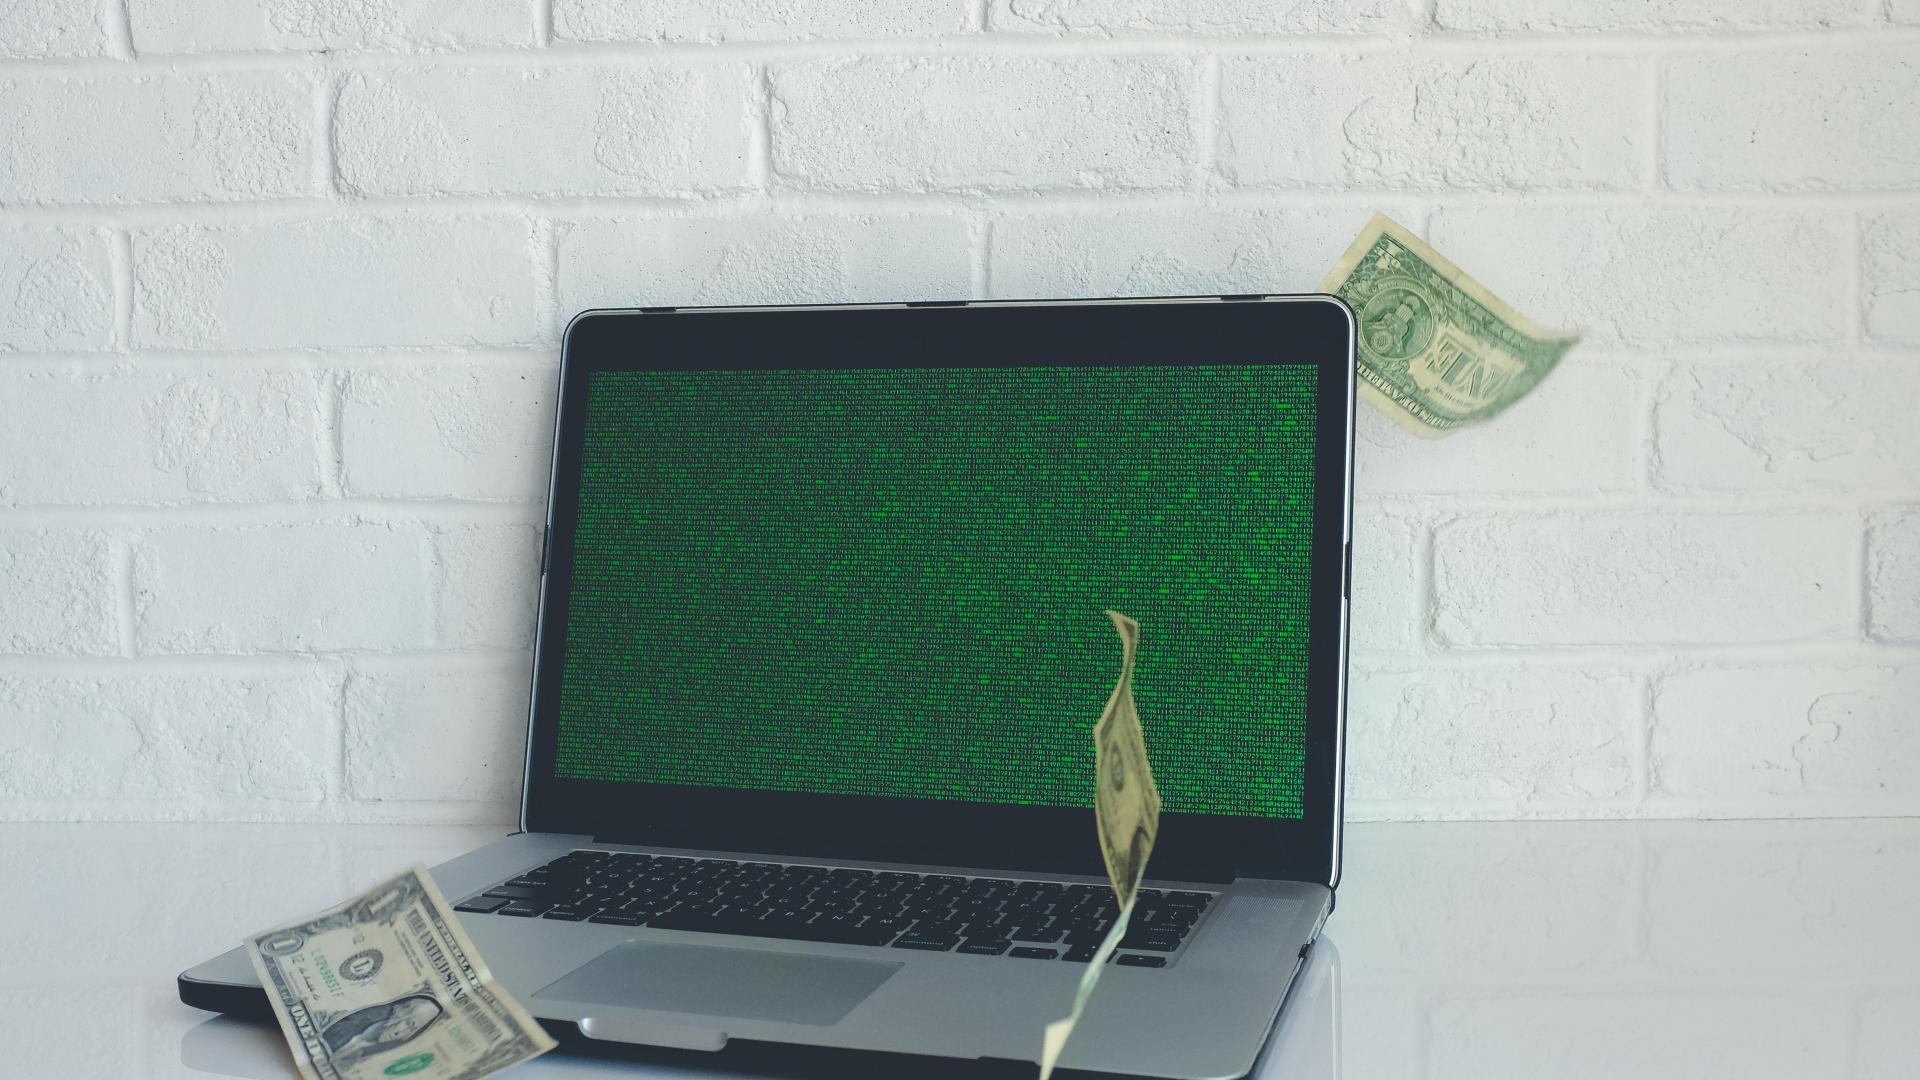 PC & Geld